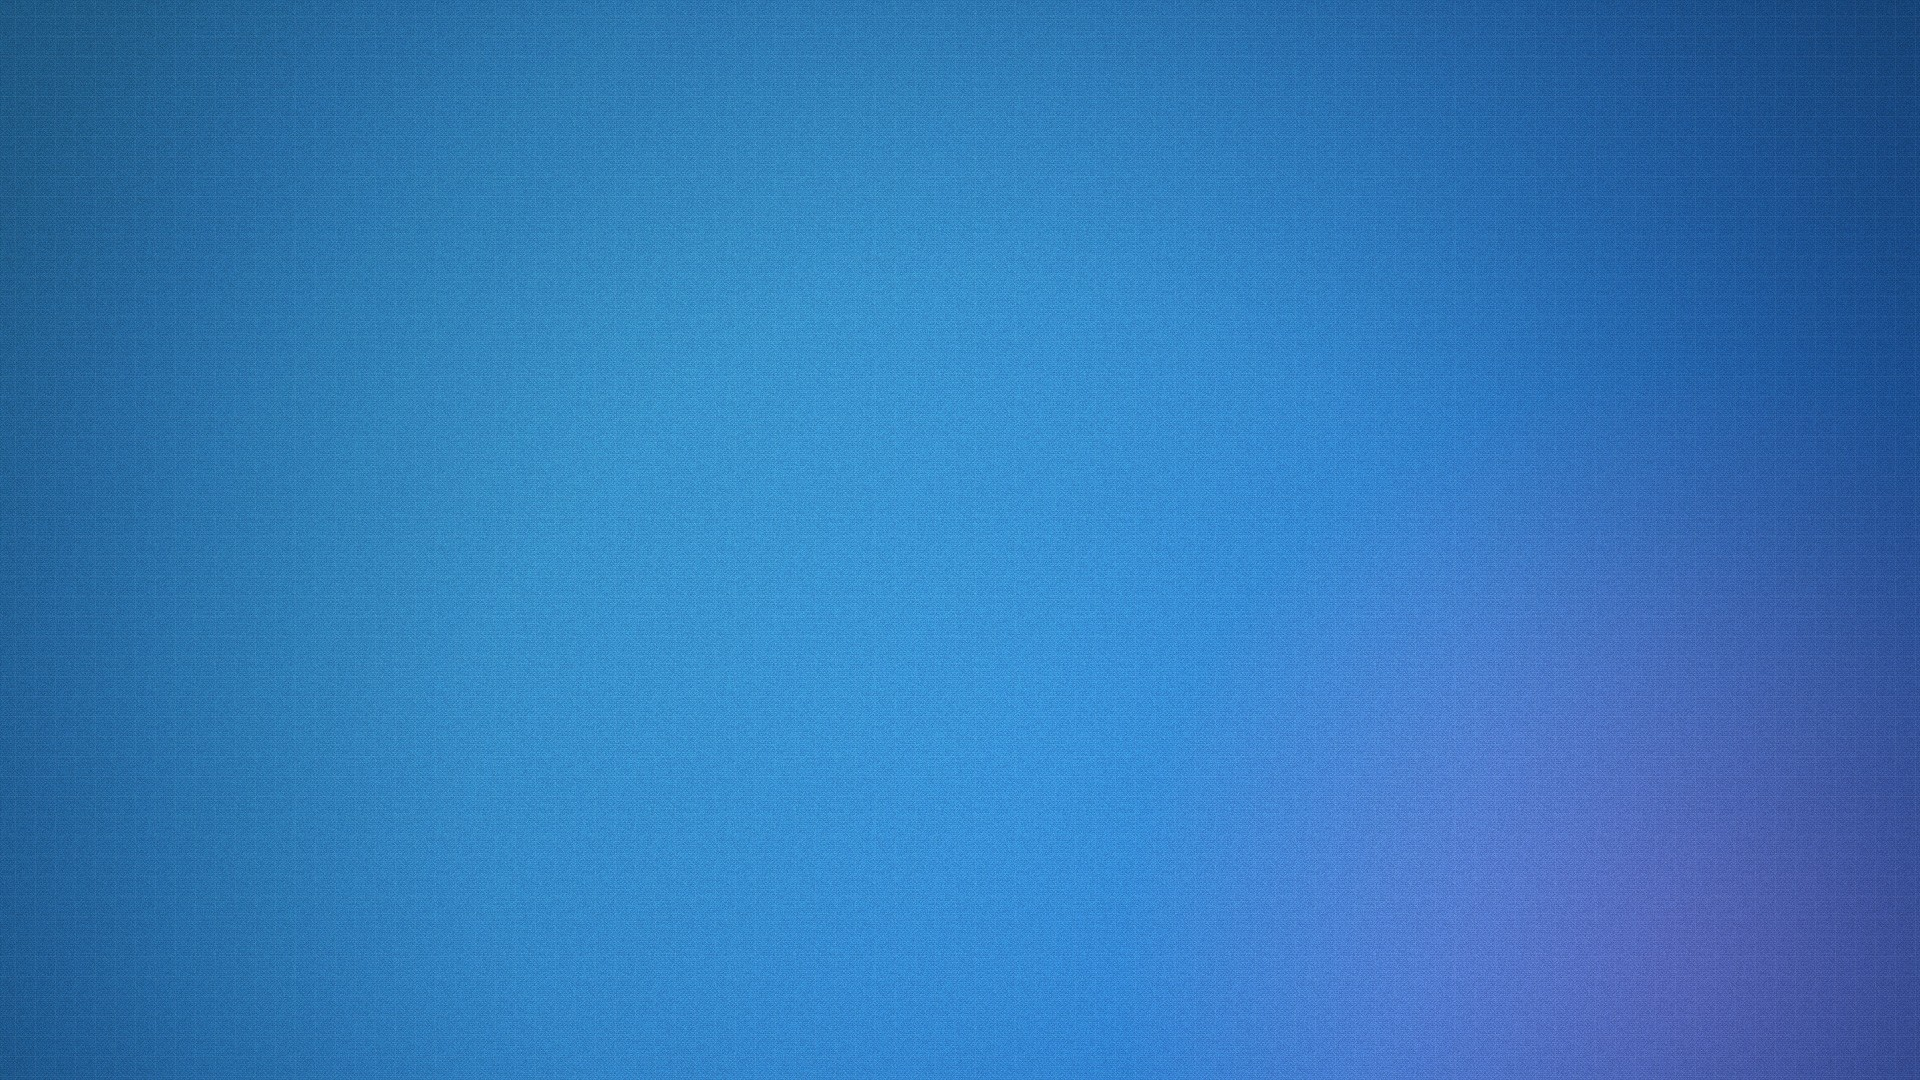 Group of 1920X1080 Light Blue Galaxy